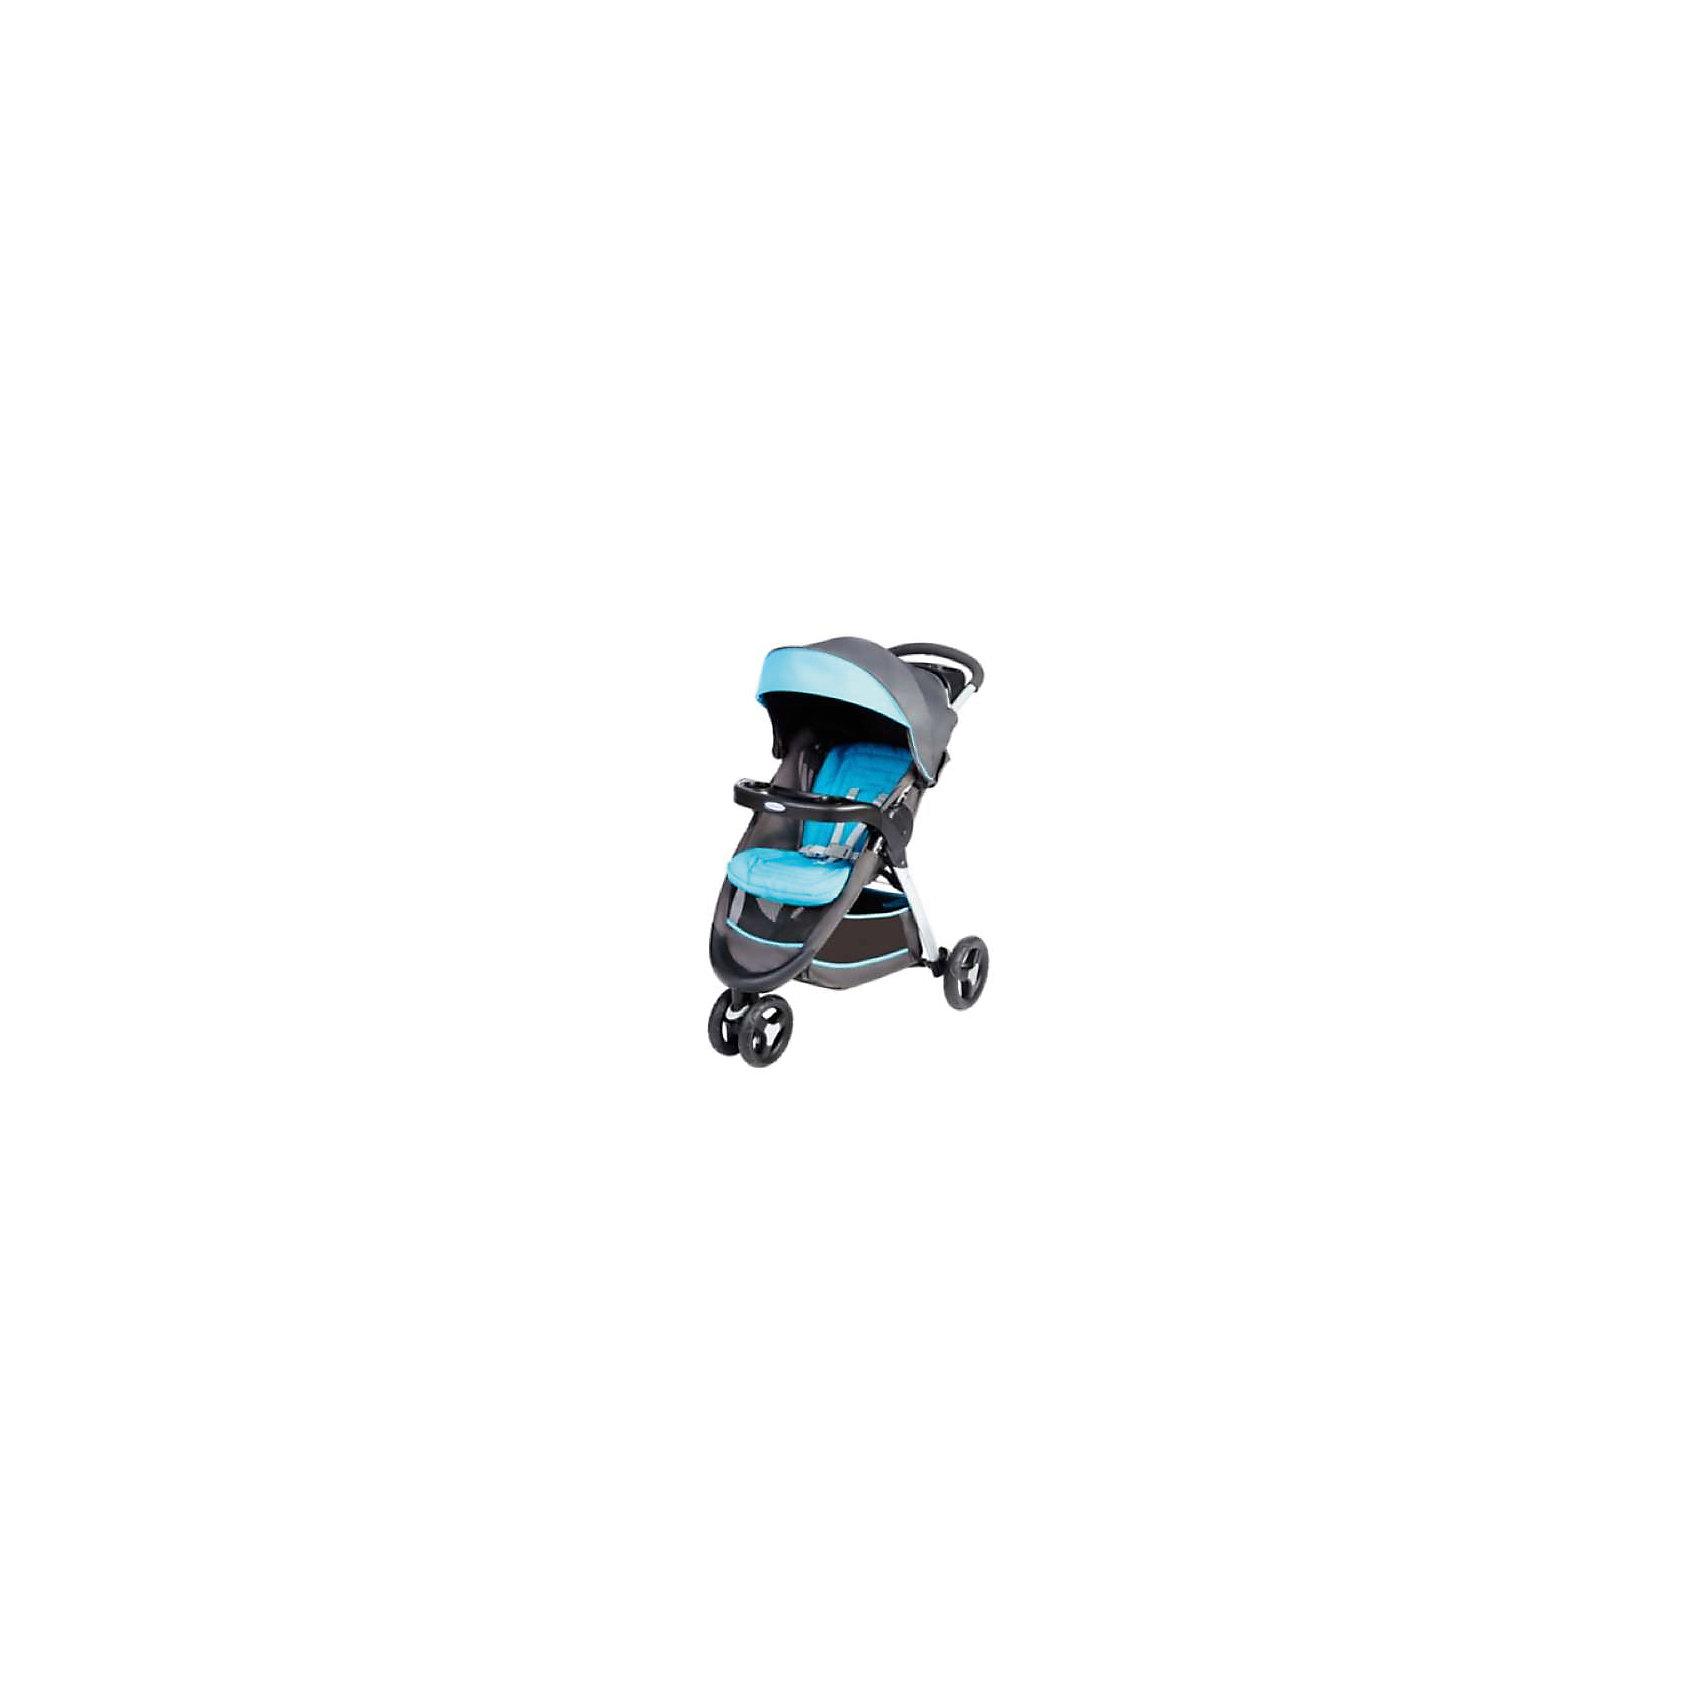 Graco Прогулочная коляска Fastaction Fold, Graco, серый-голубой коляска graco graco прогулочная коляска mirage w parent tray and boot jaffa stripe